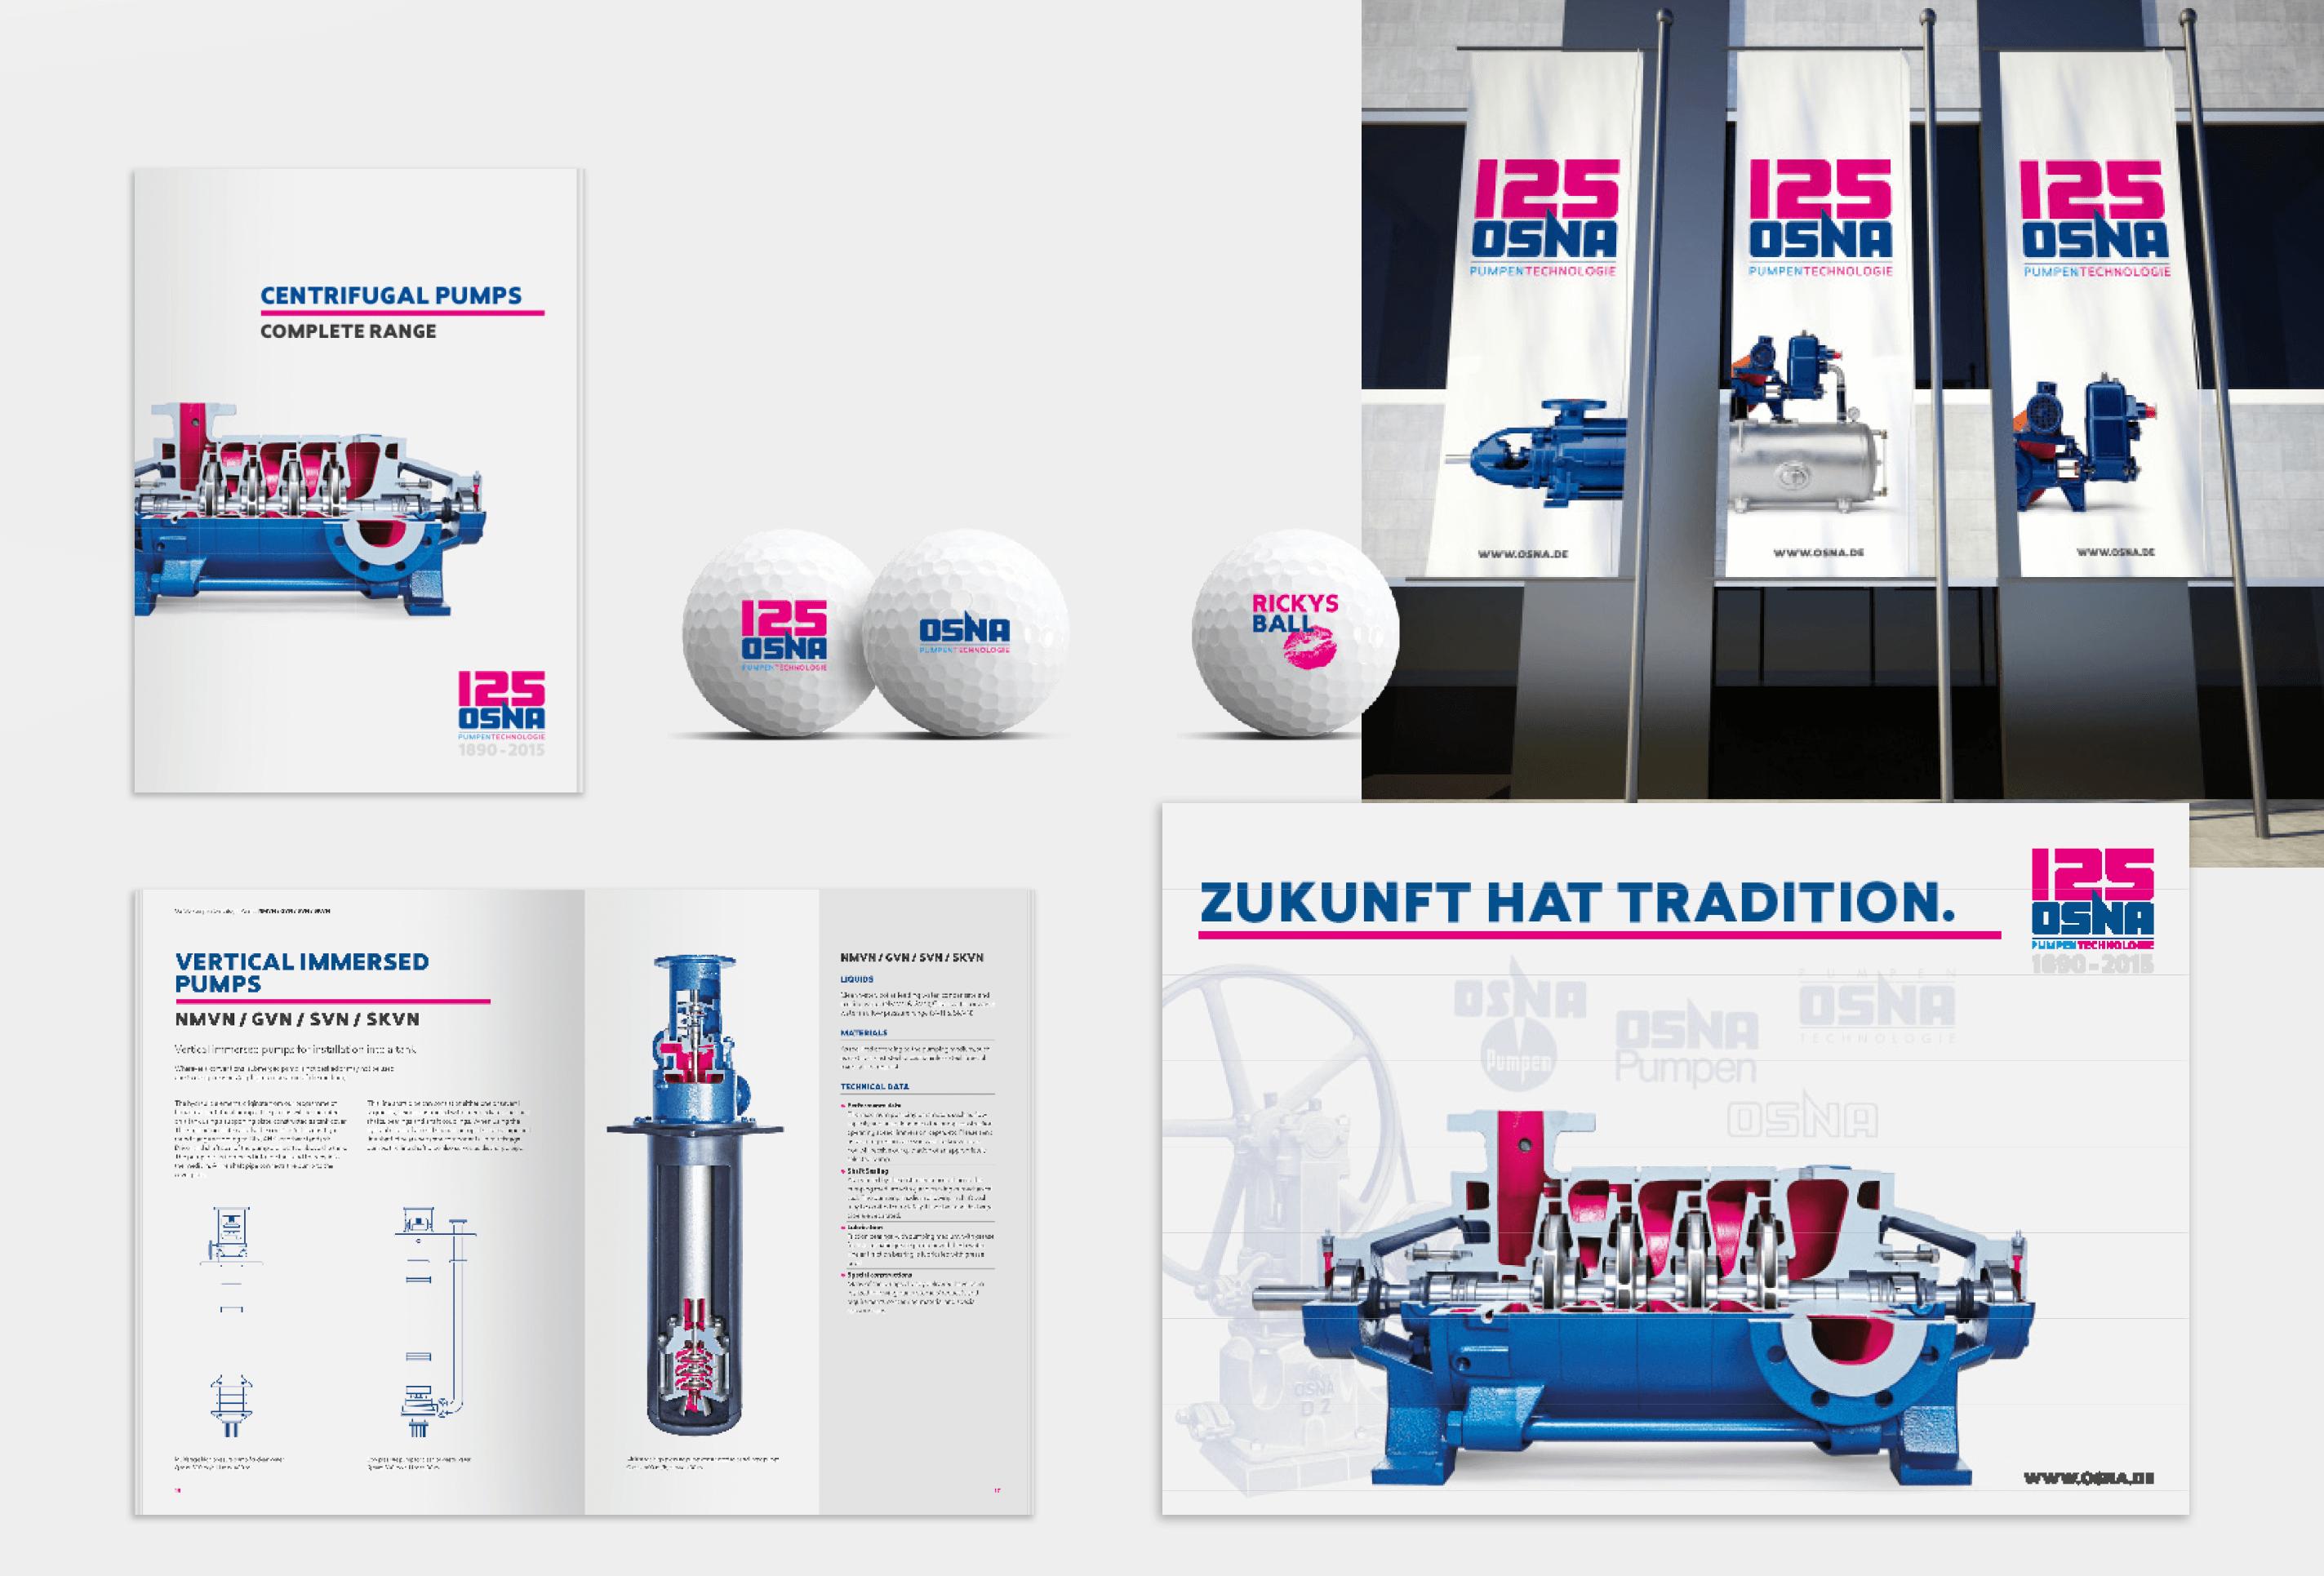 Referenz OSNA-Pumpen Corporate Design Mockup